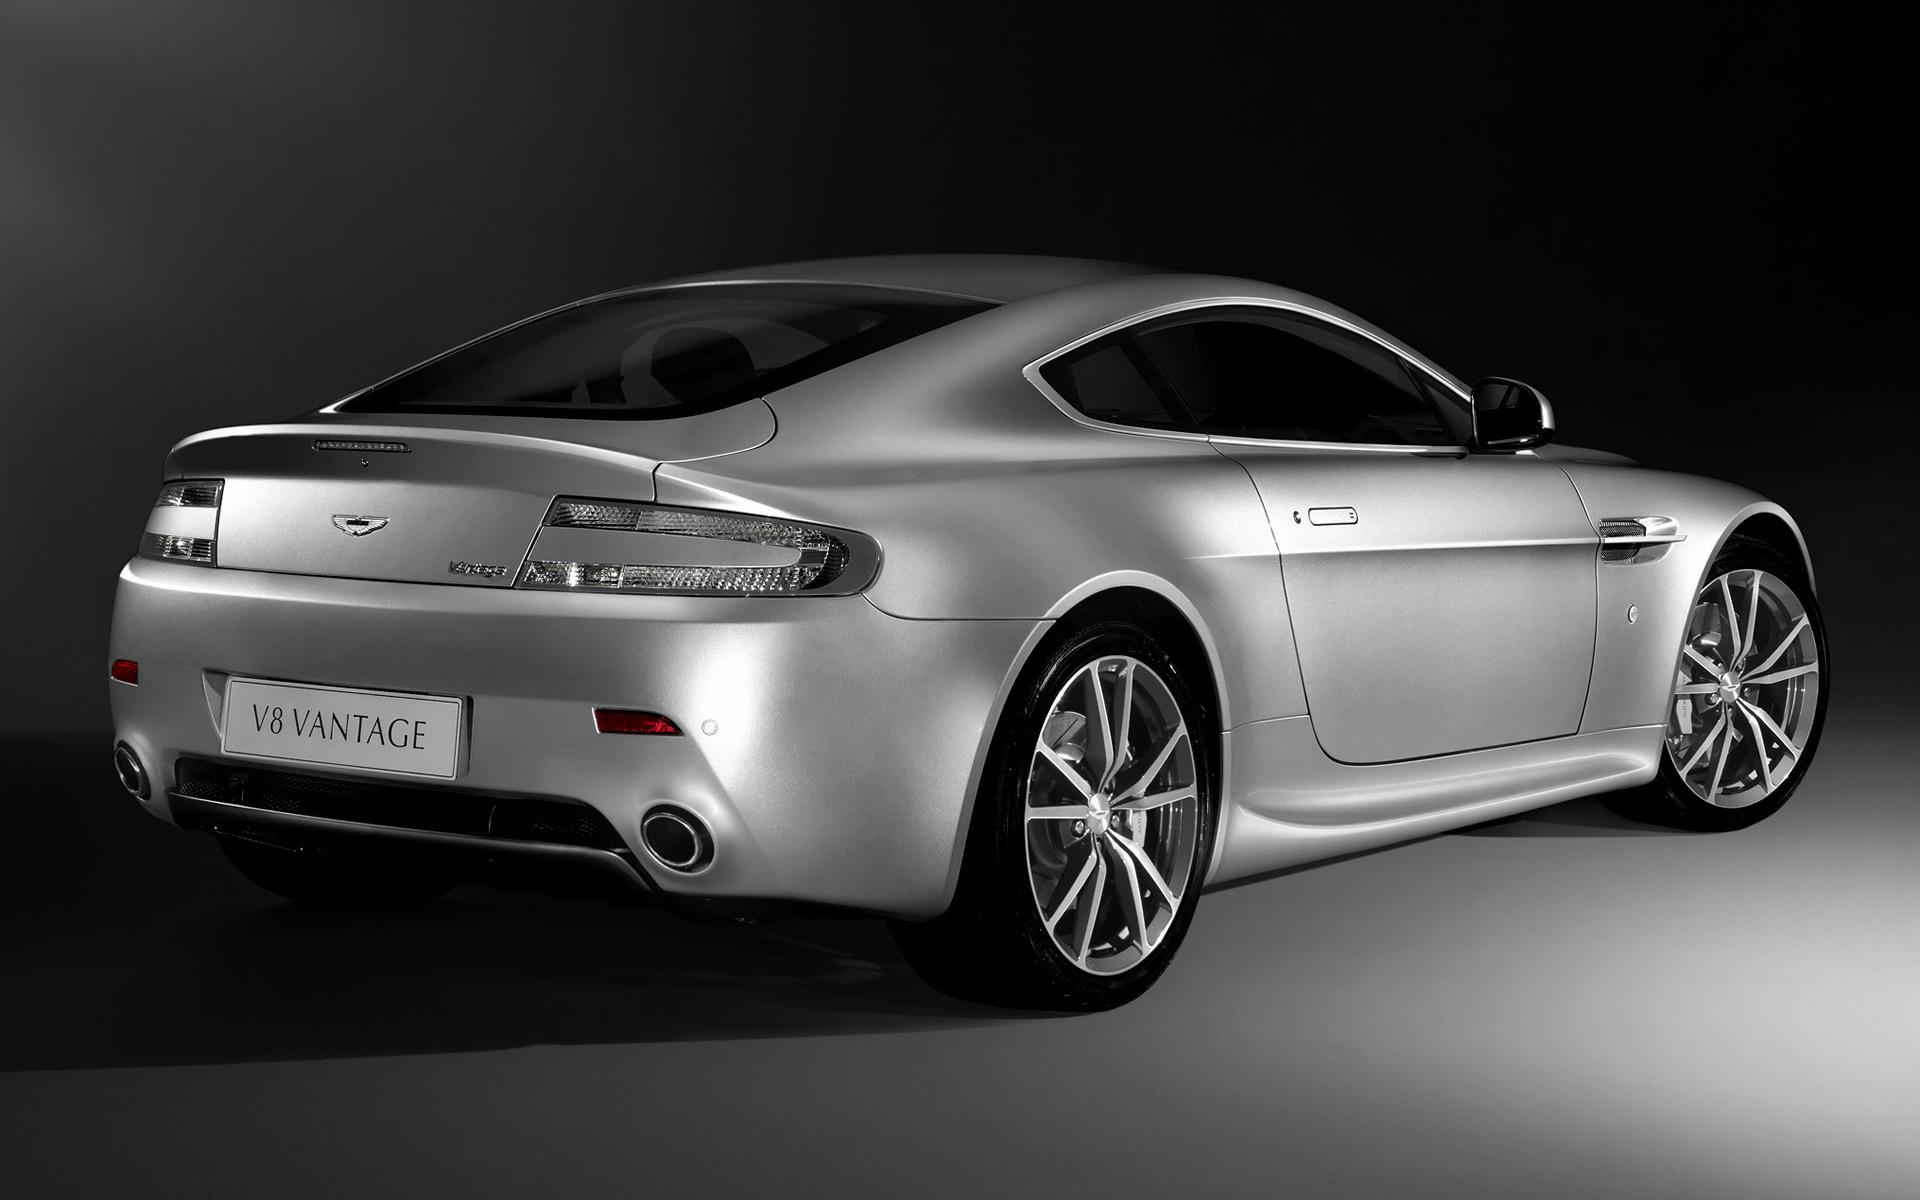 2008 Aston Martin V8 Vantage Uk Wallpapers And Hd Images Car Pixel